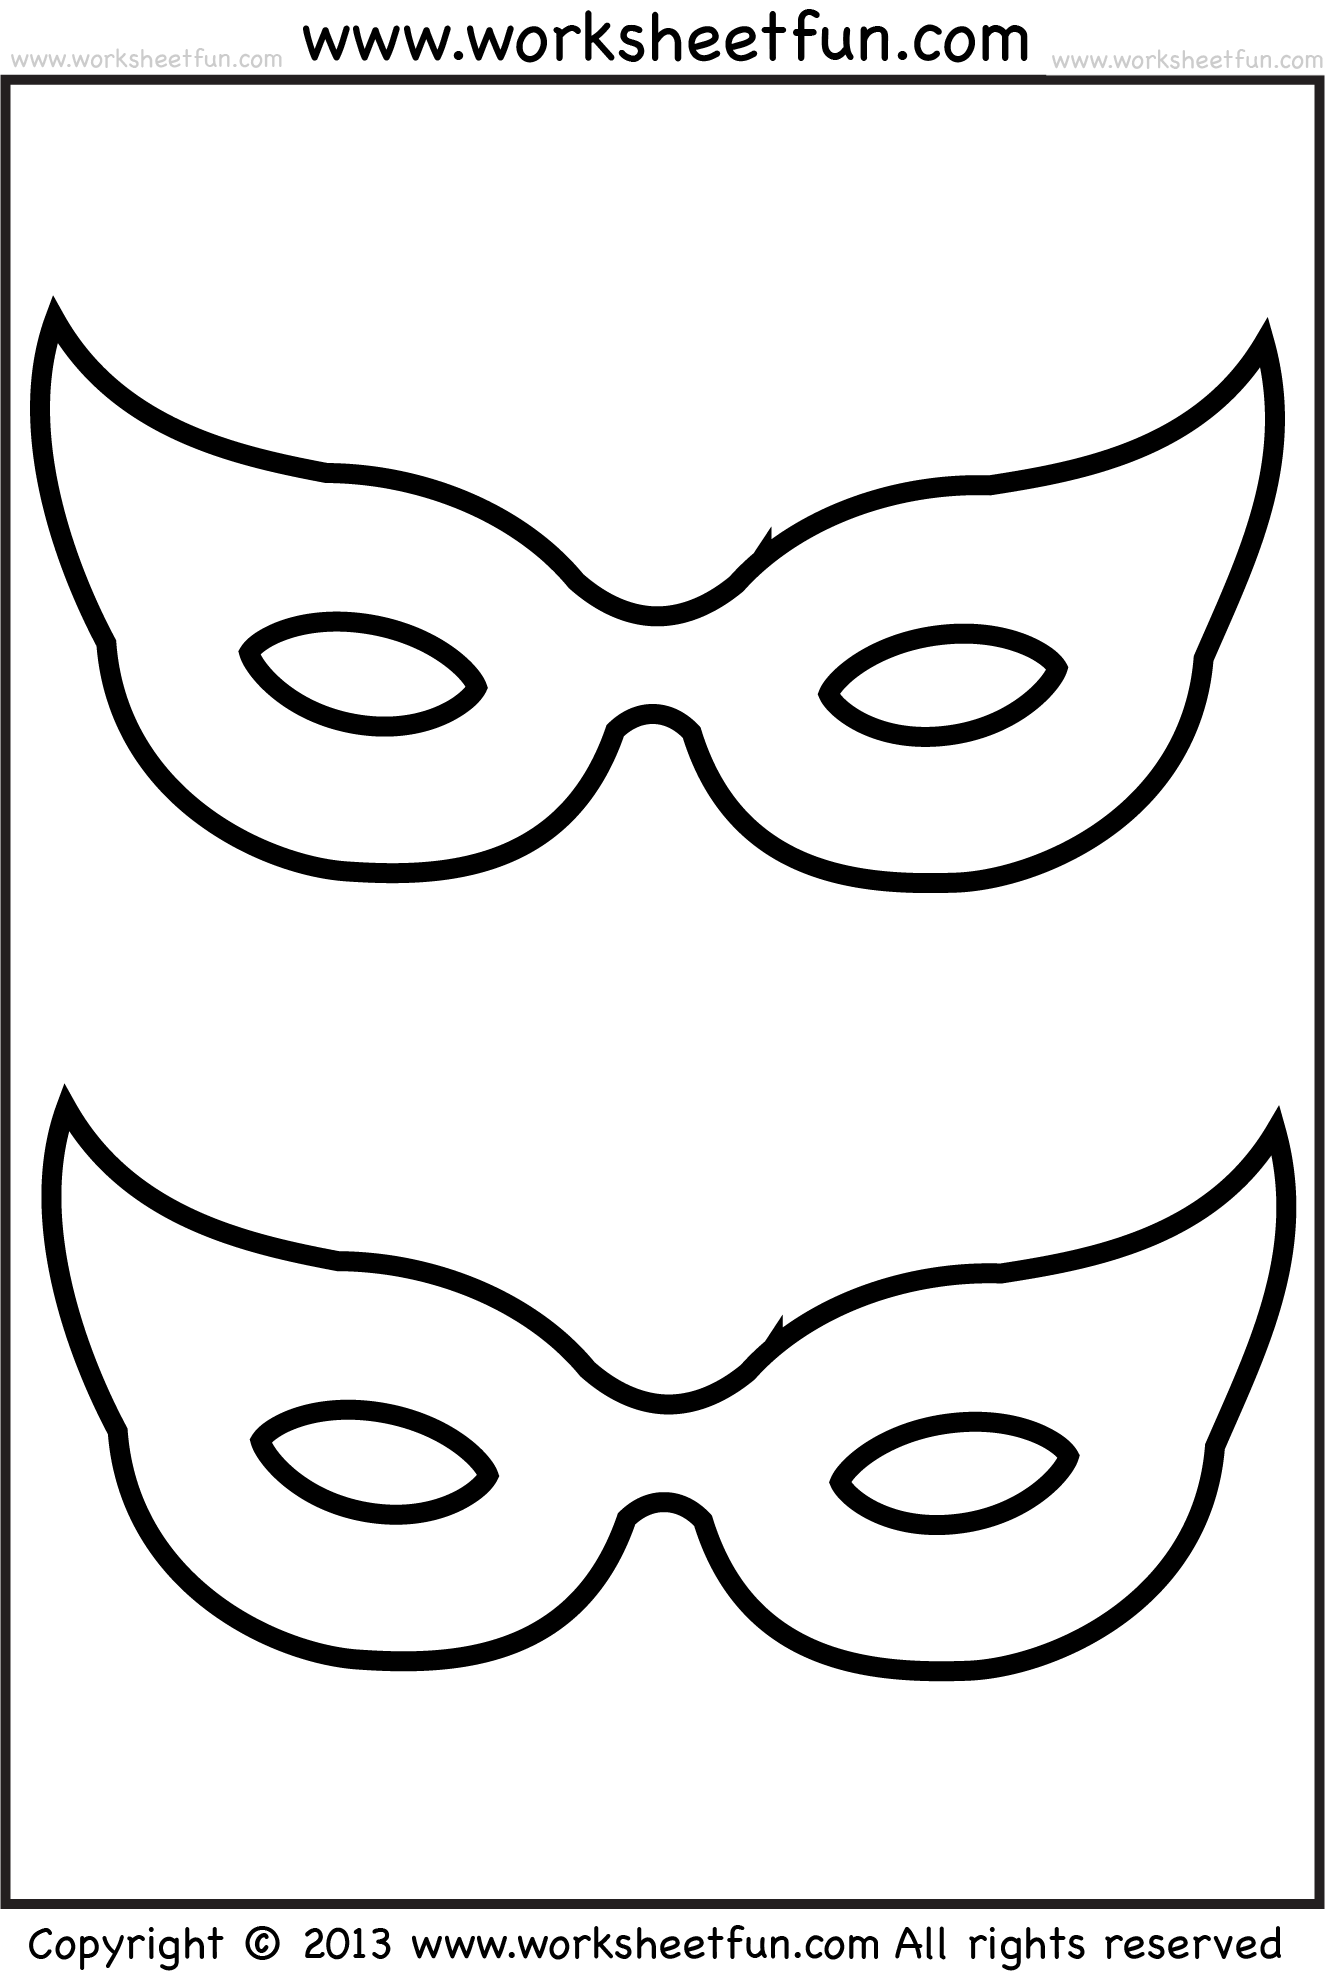 Free Tracing Worksheet For Preschoolers Halloween